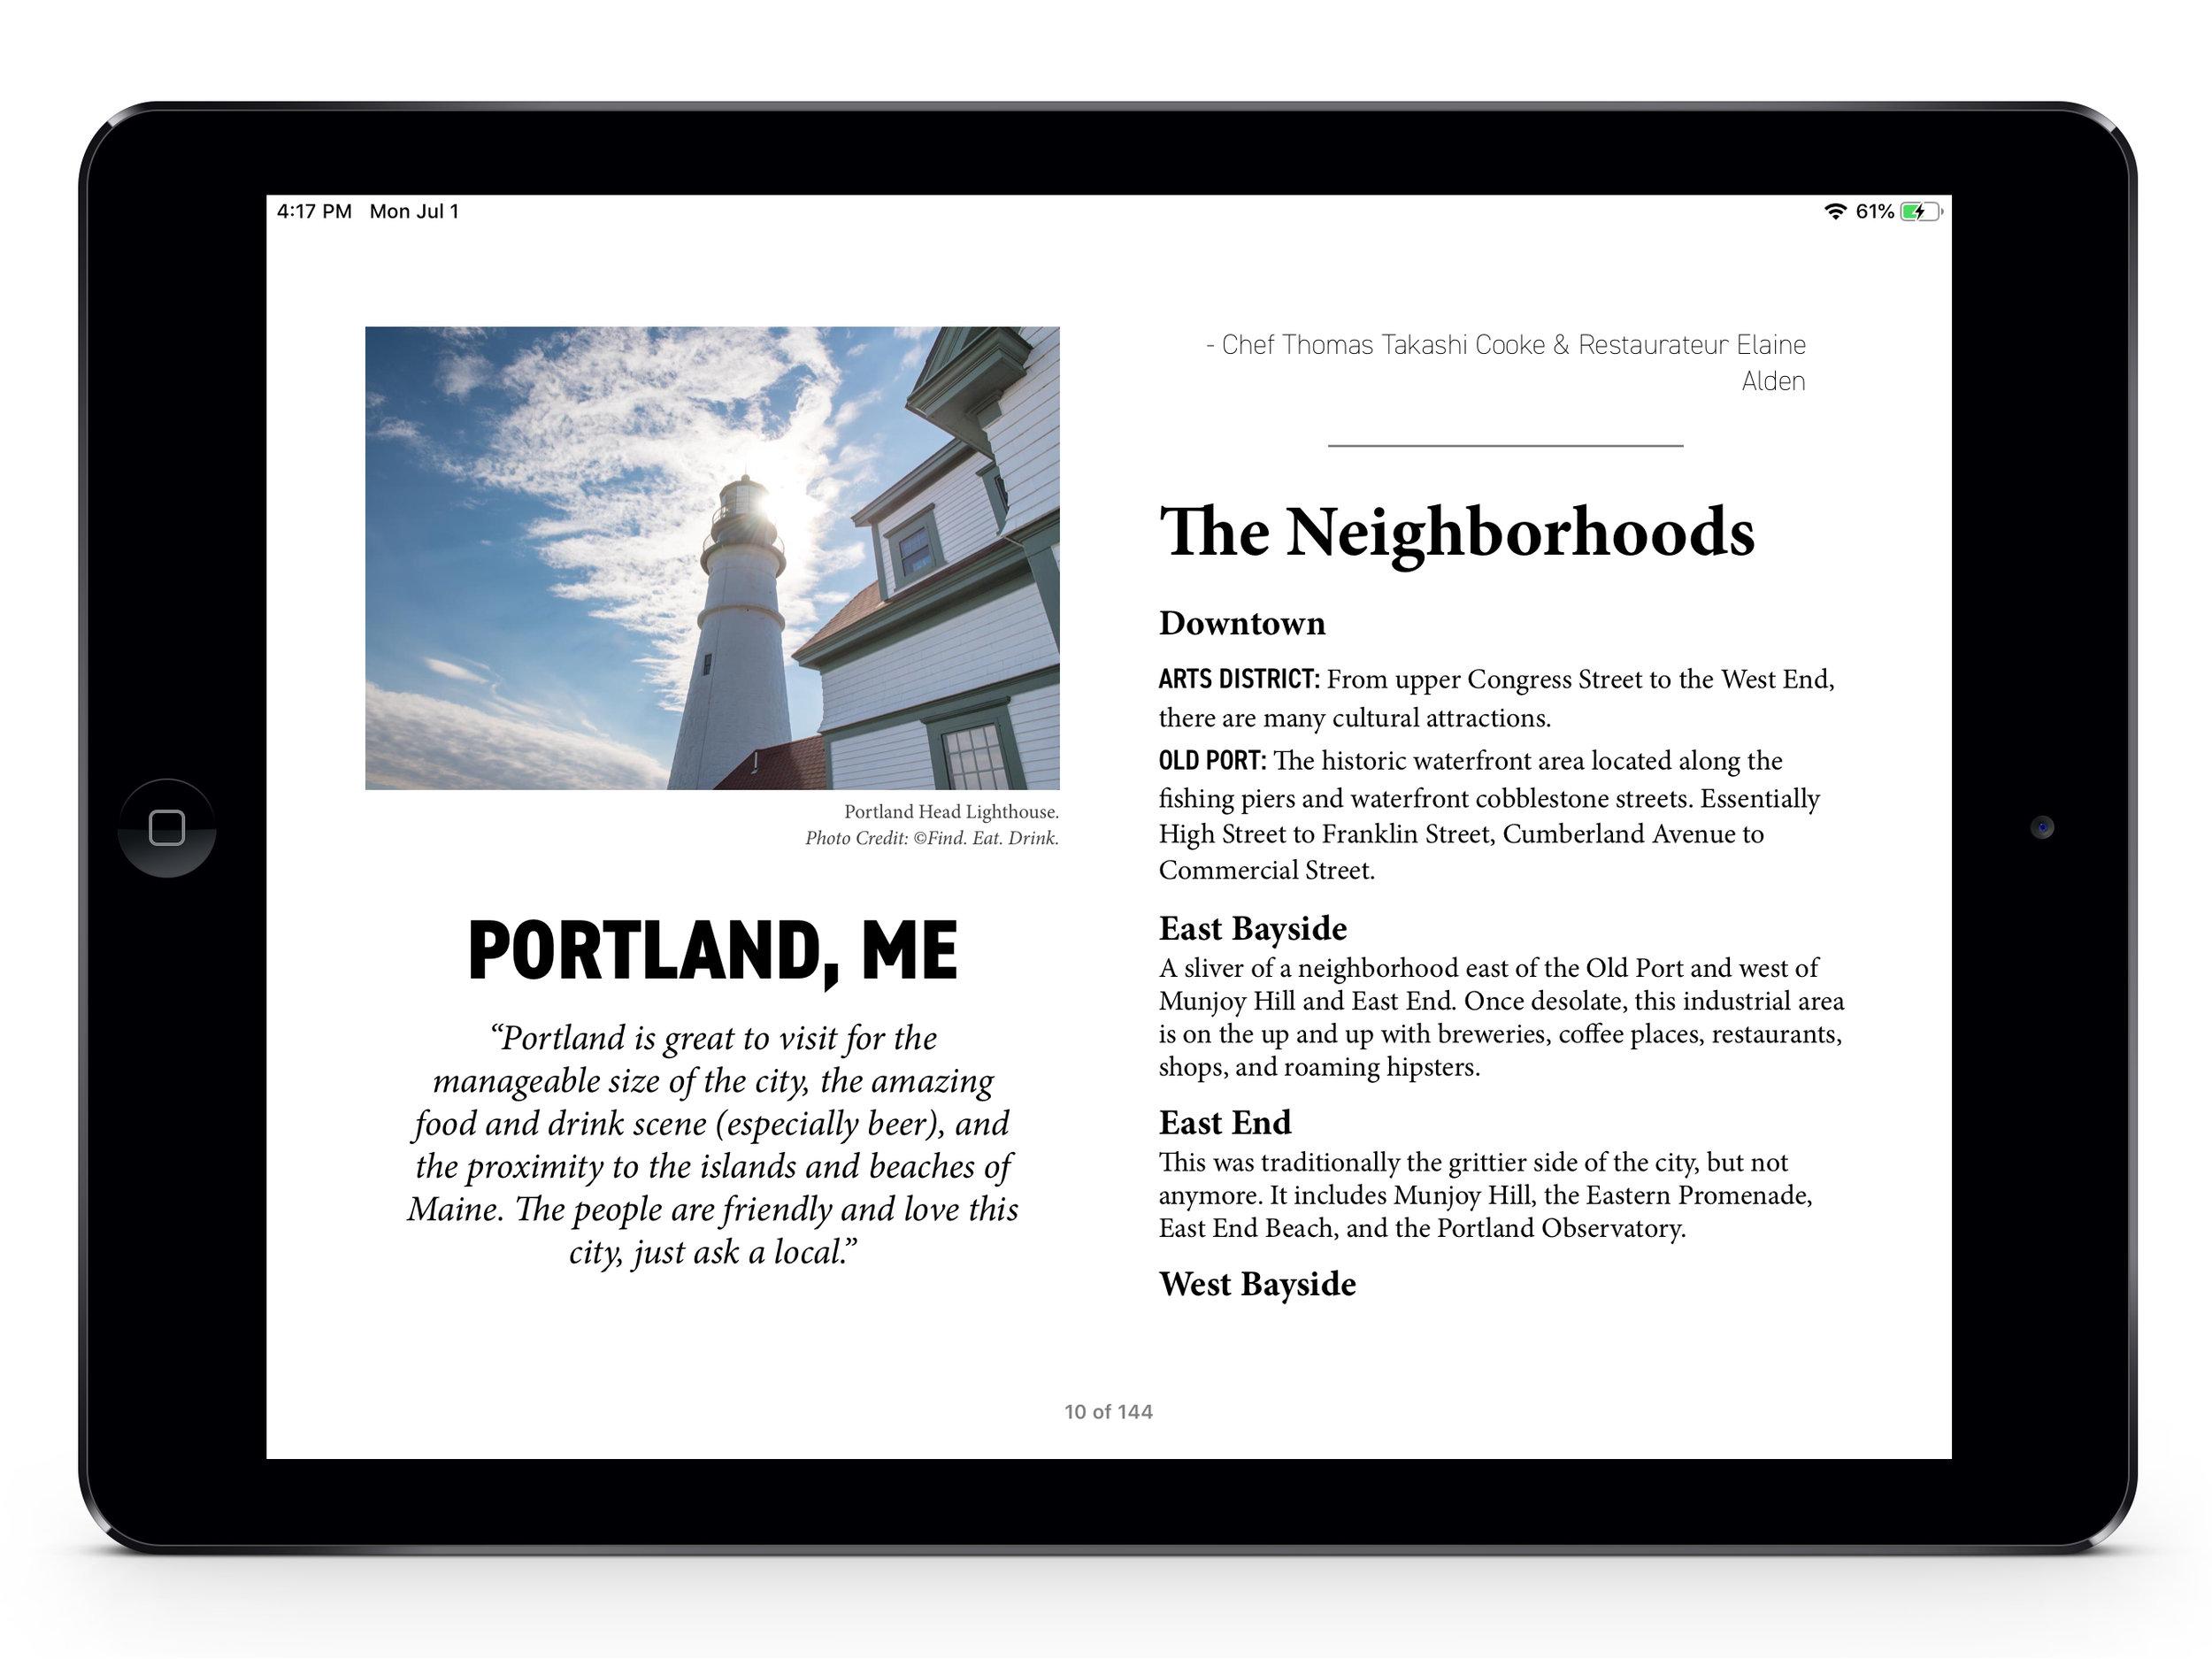 iPadAir_PortlandME_Screenshots_Landscape_1.4.jpg